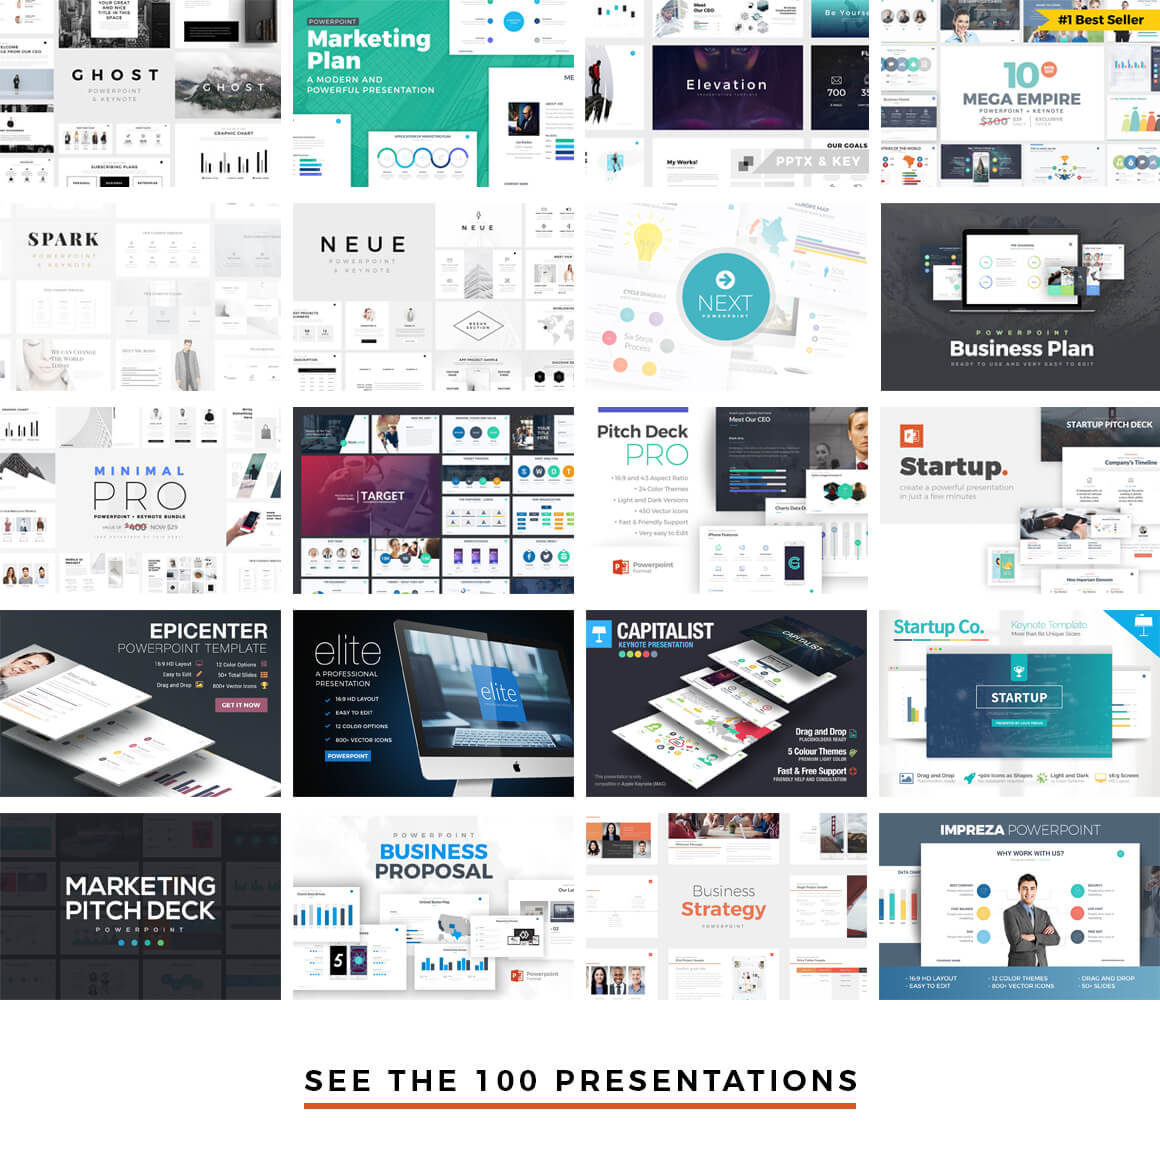 Best PowerPoint Templates, Best Keynote Themes, Best Google Slides Themes